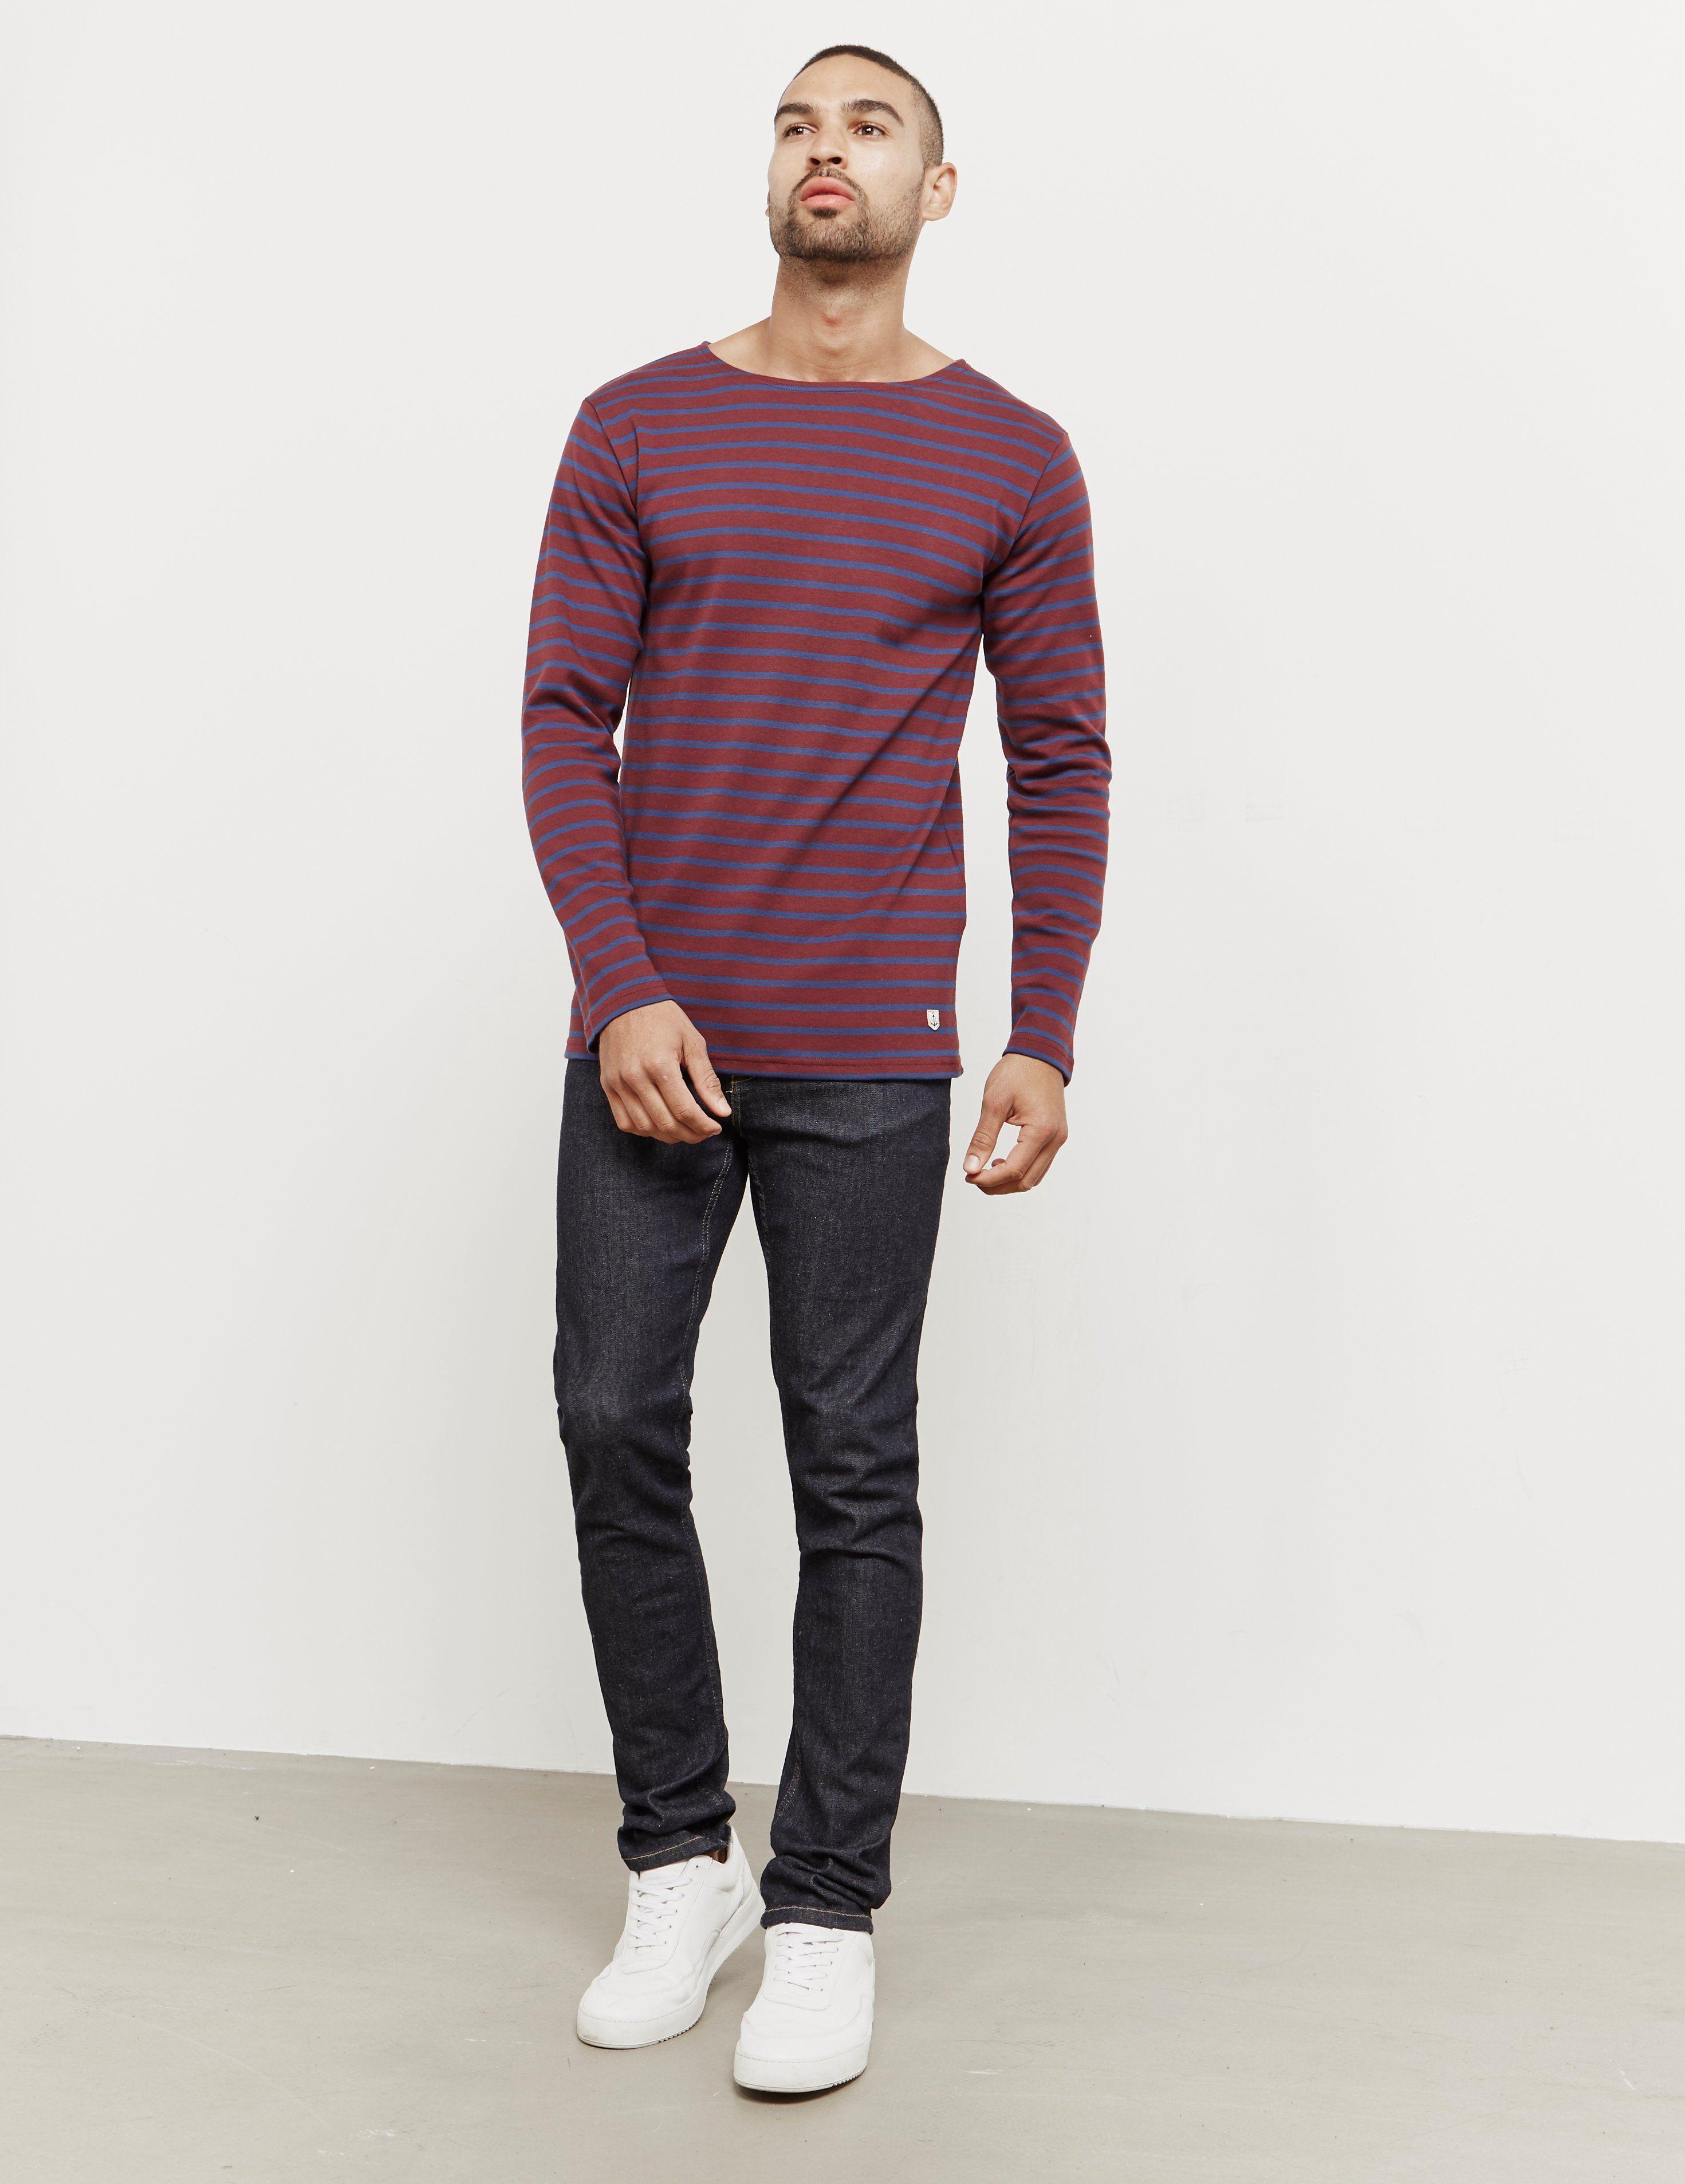 Armor Lux Stripe Long Sleeve T-Shirt